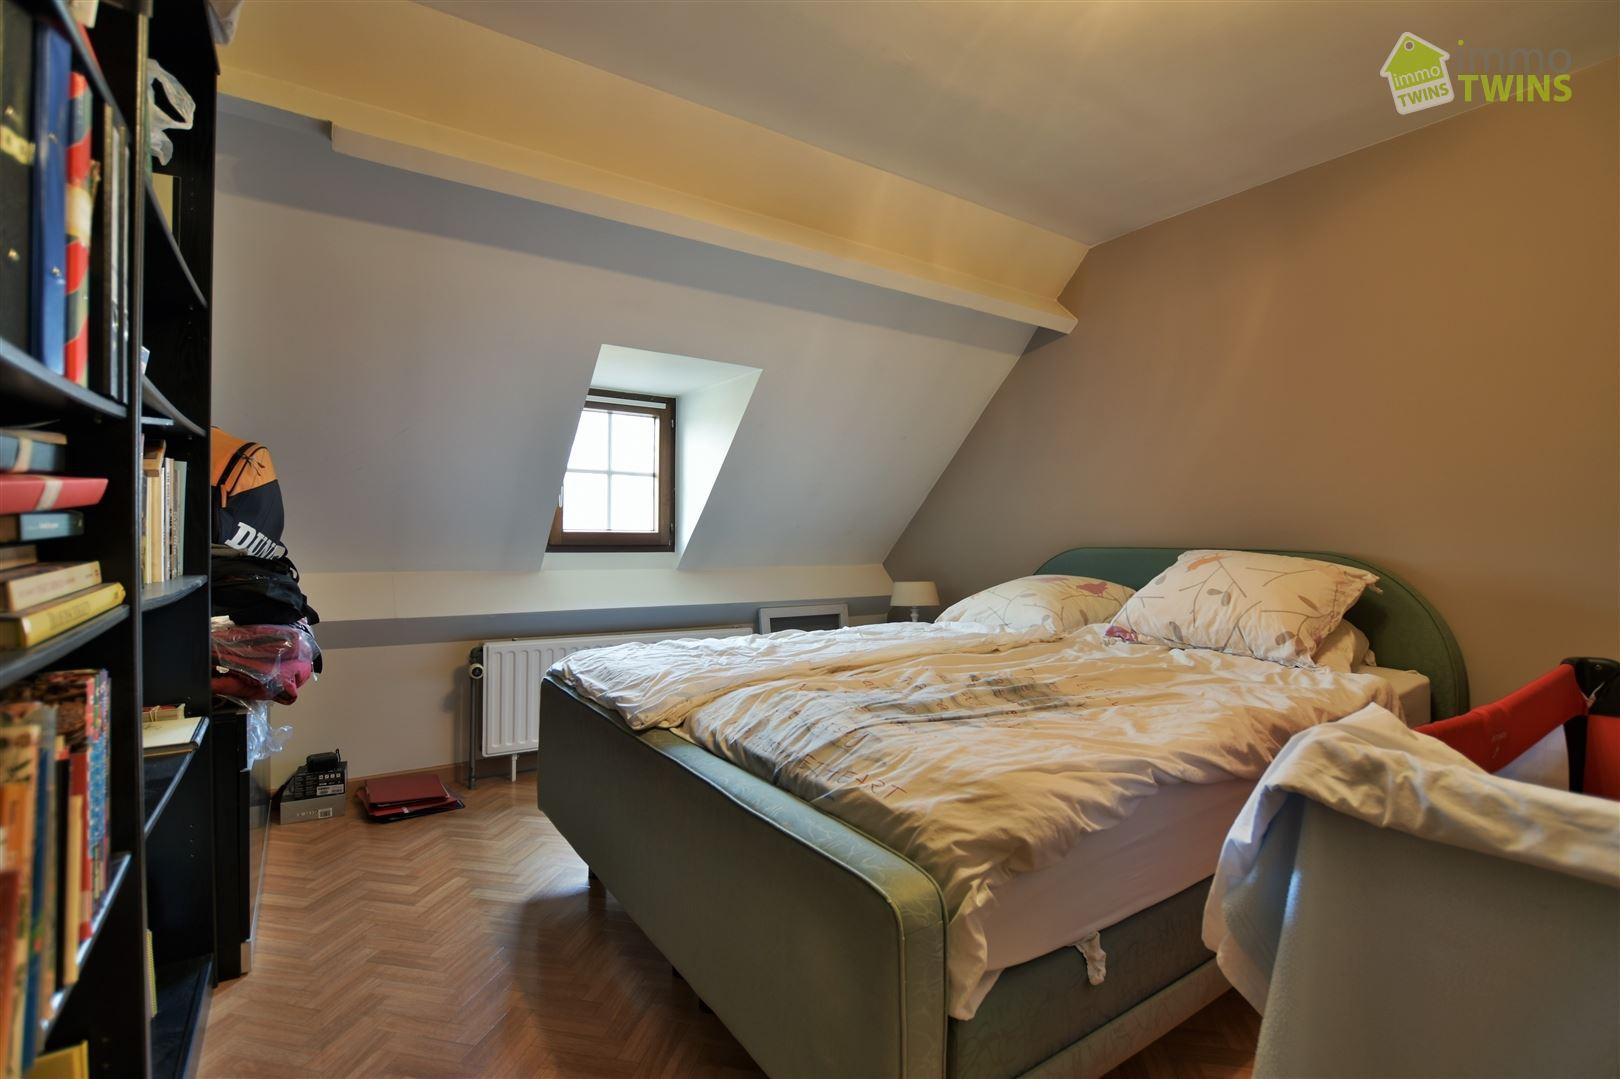 Foto 25 : Duplex/triplex te 9200 Dendermonde (België) - Prijs € 398.000